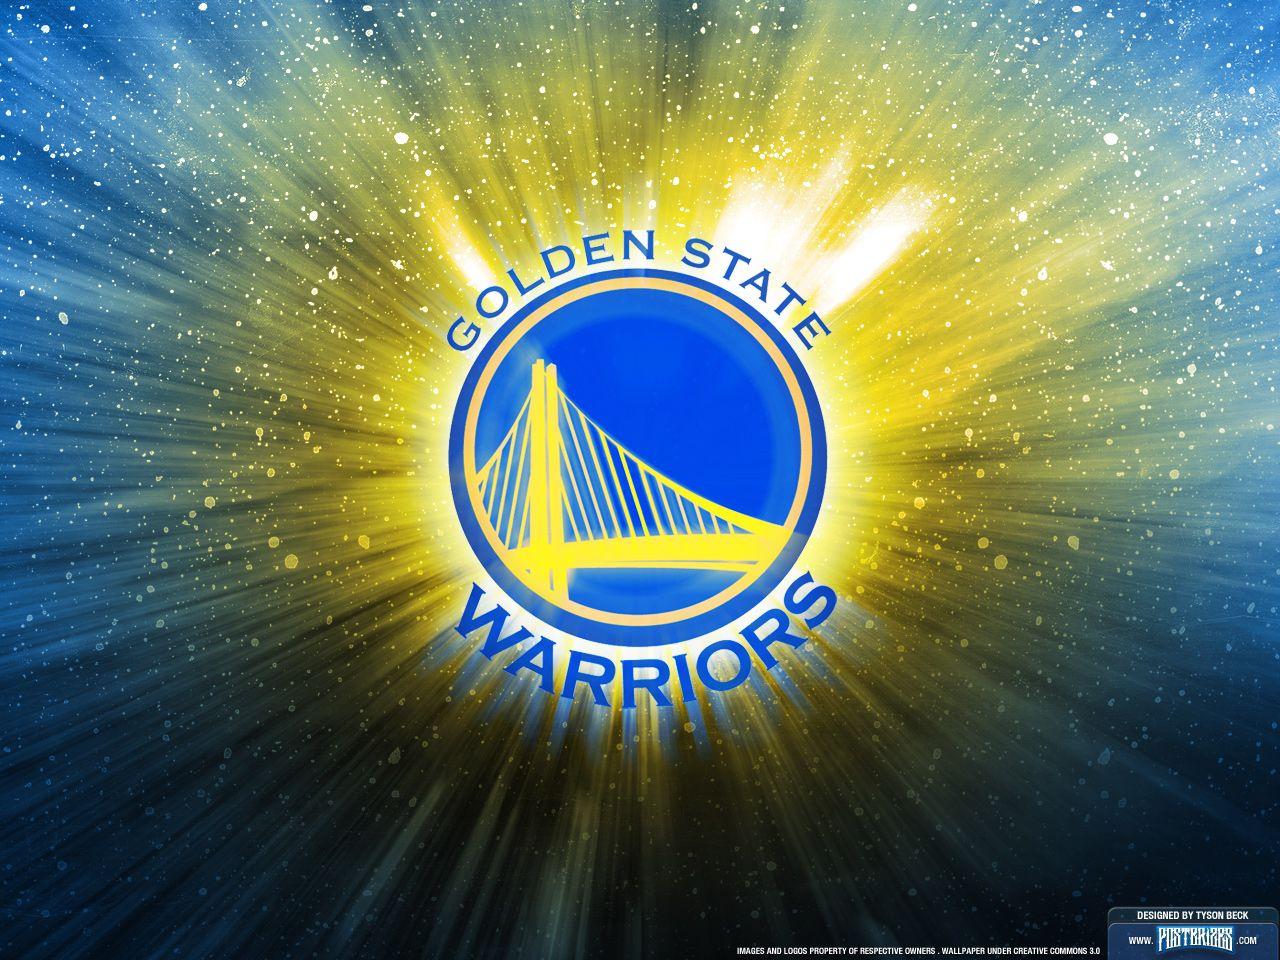 Golden State Warriors Logo Wallpaper Golden State Warriors Logo Golden State Warriors Wallpaper Warrior Logo